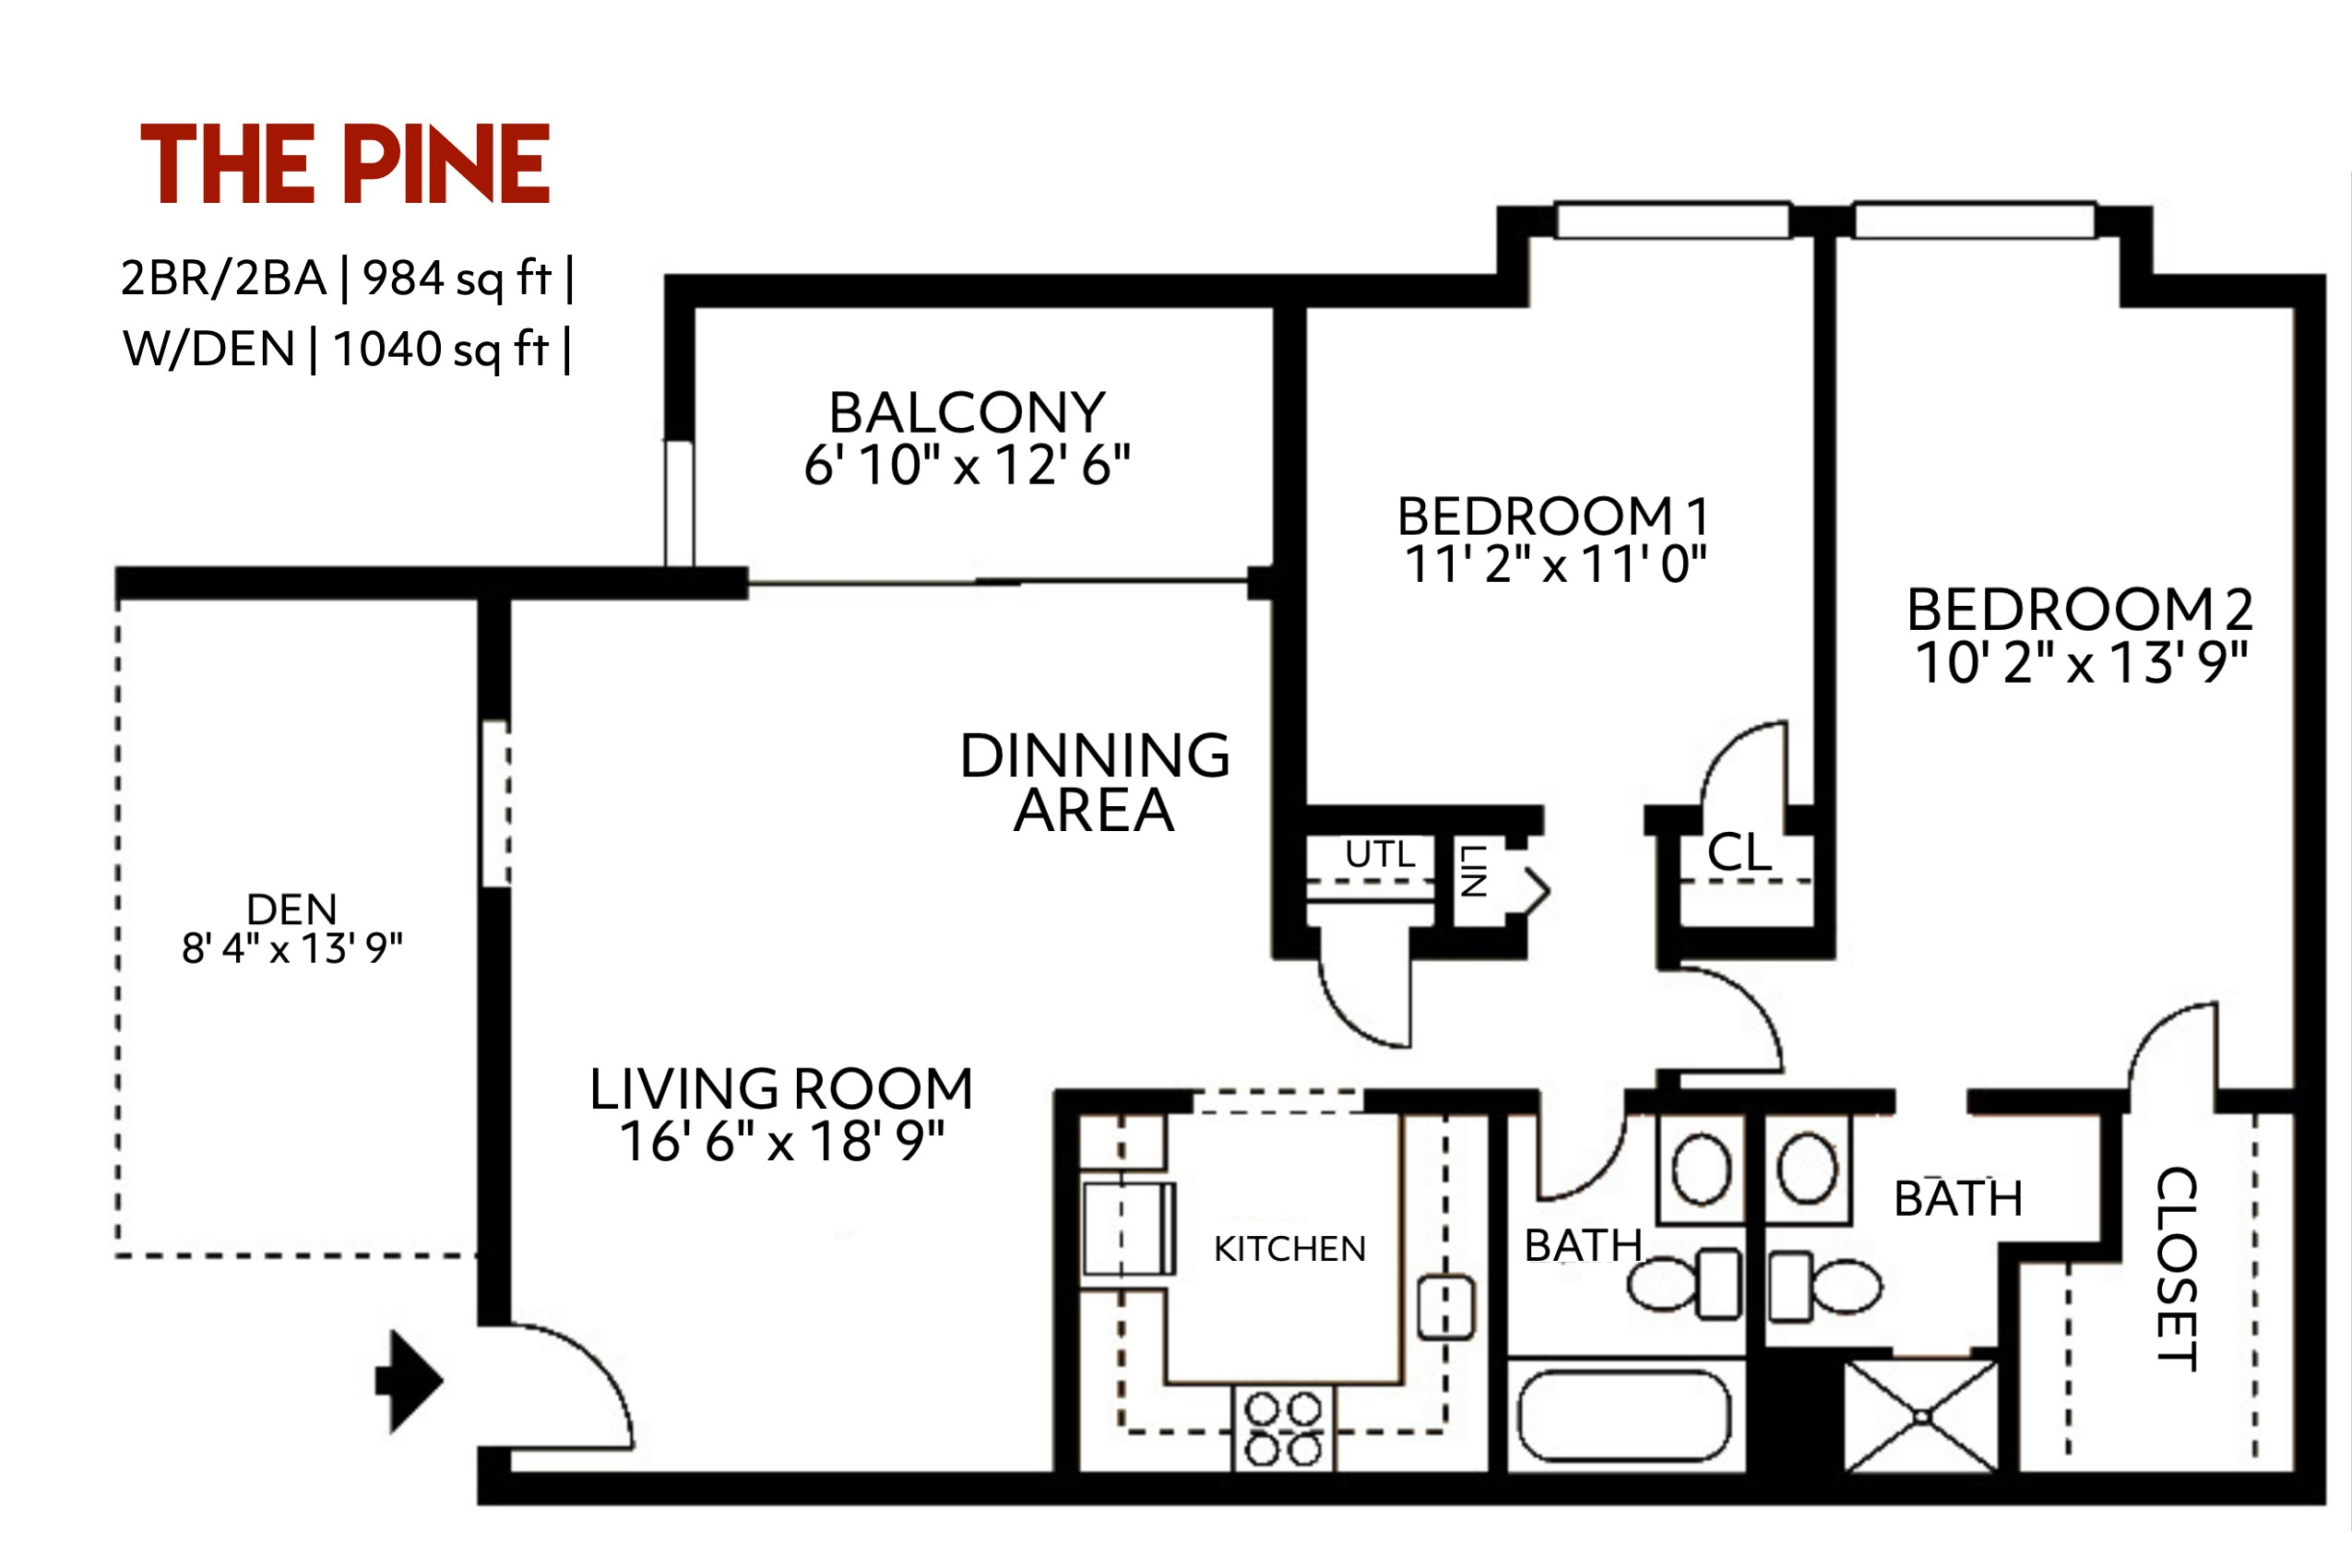 The Pine Floorplan